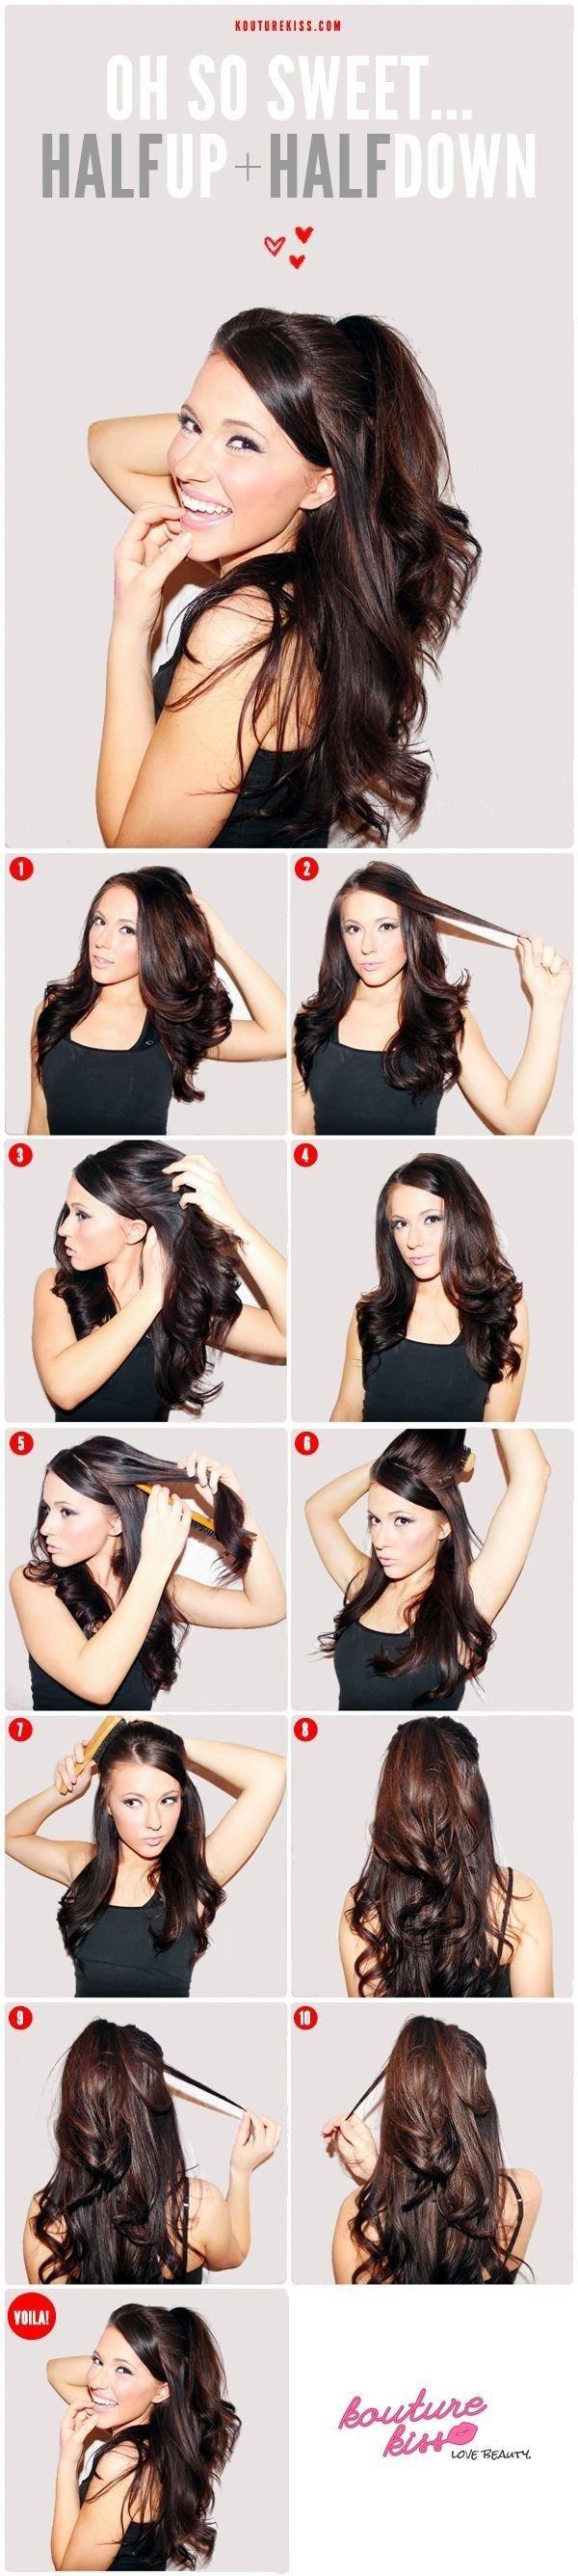 brown,hairstyle,brand,sense,leg,